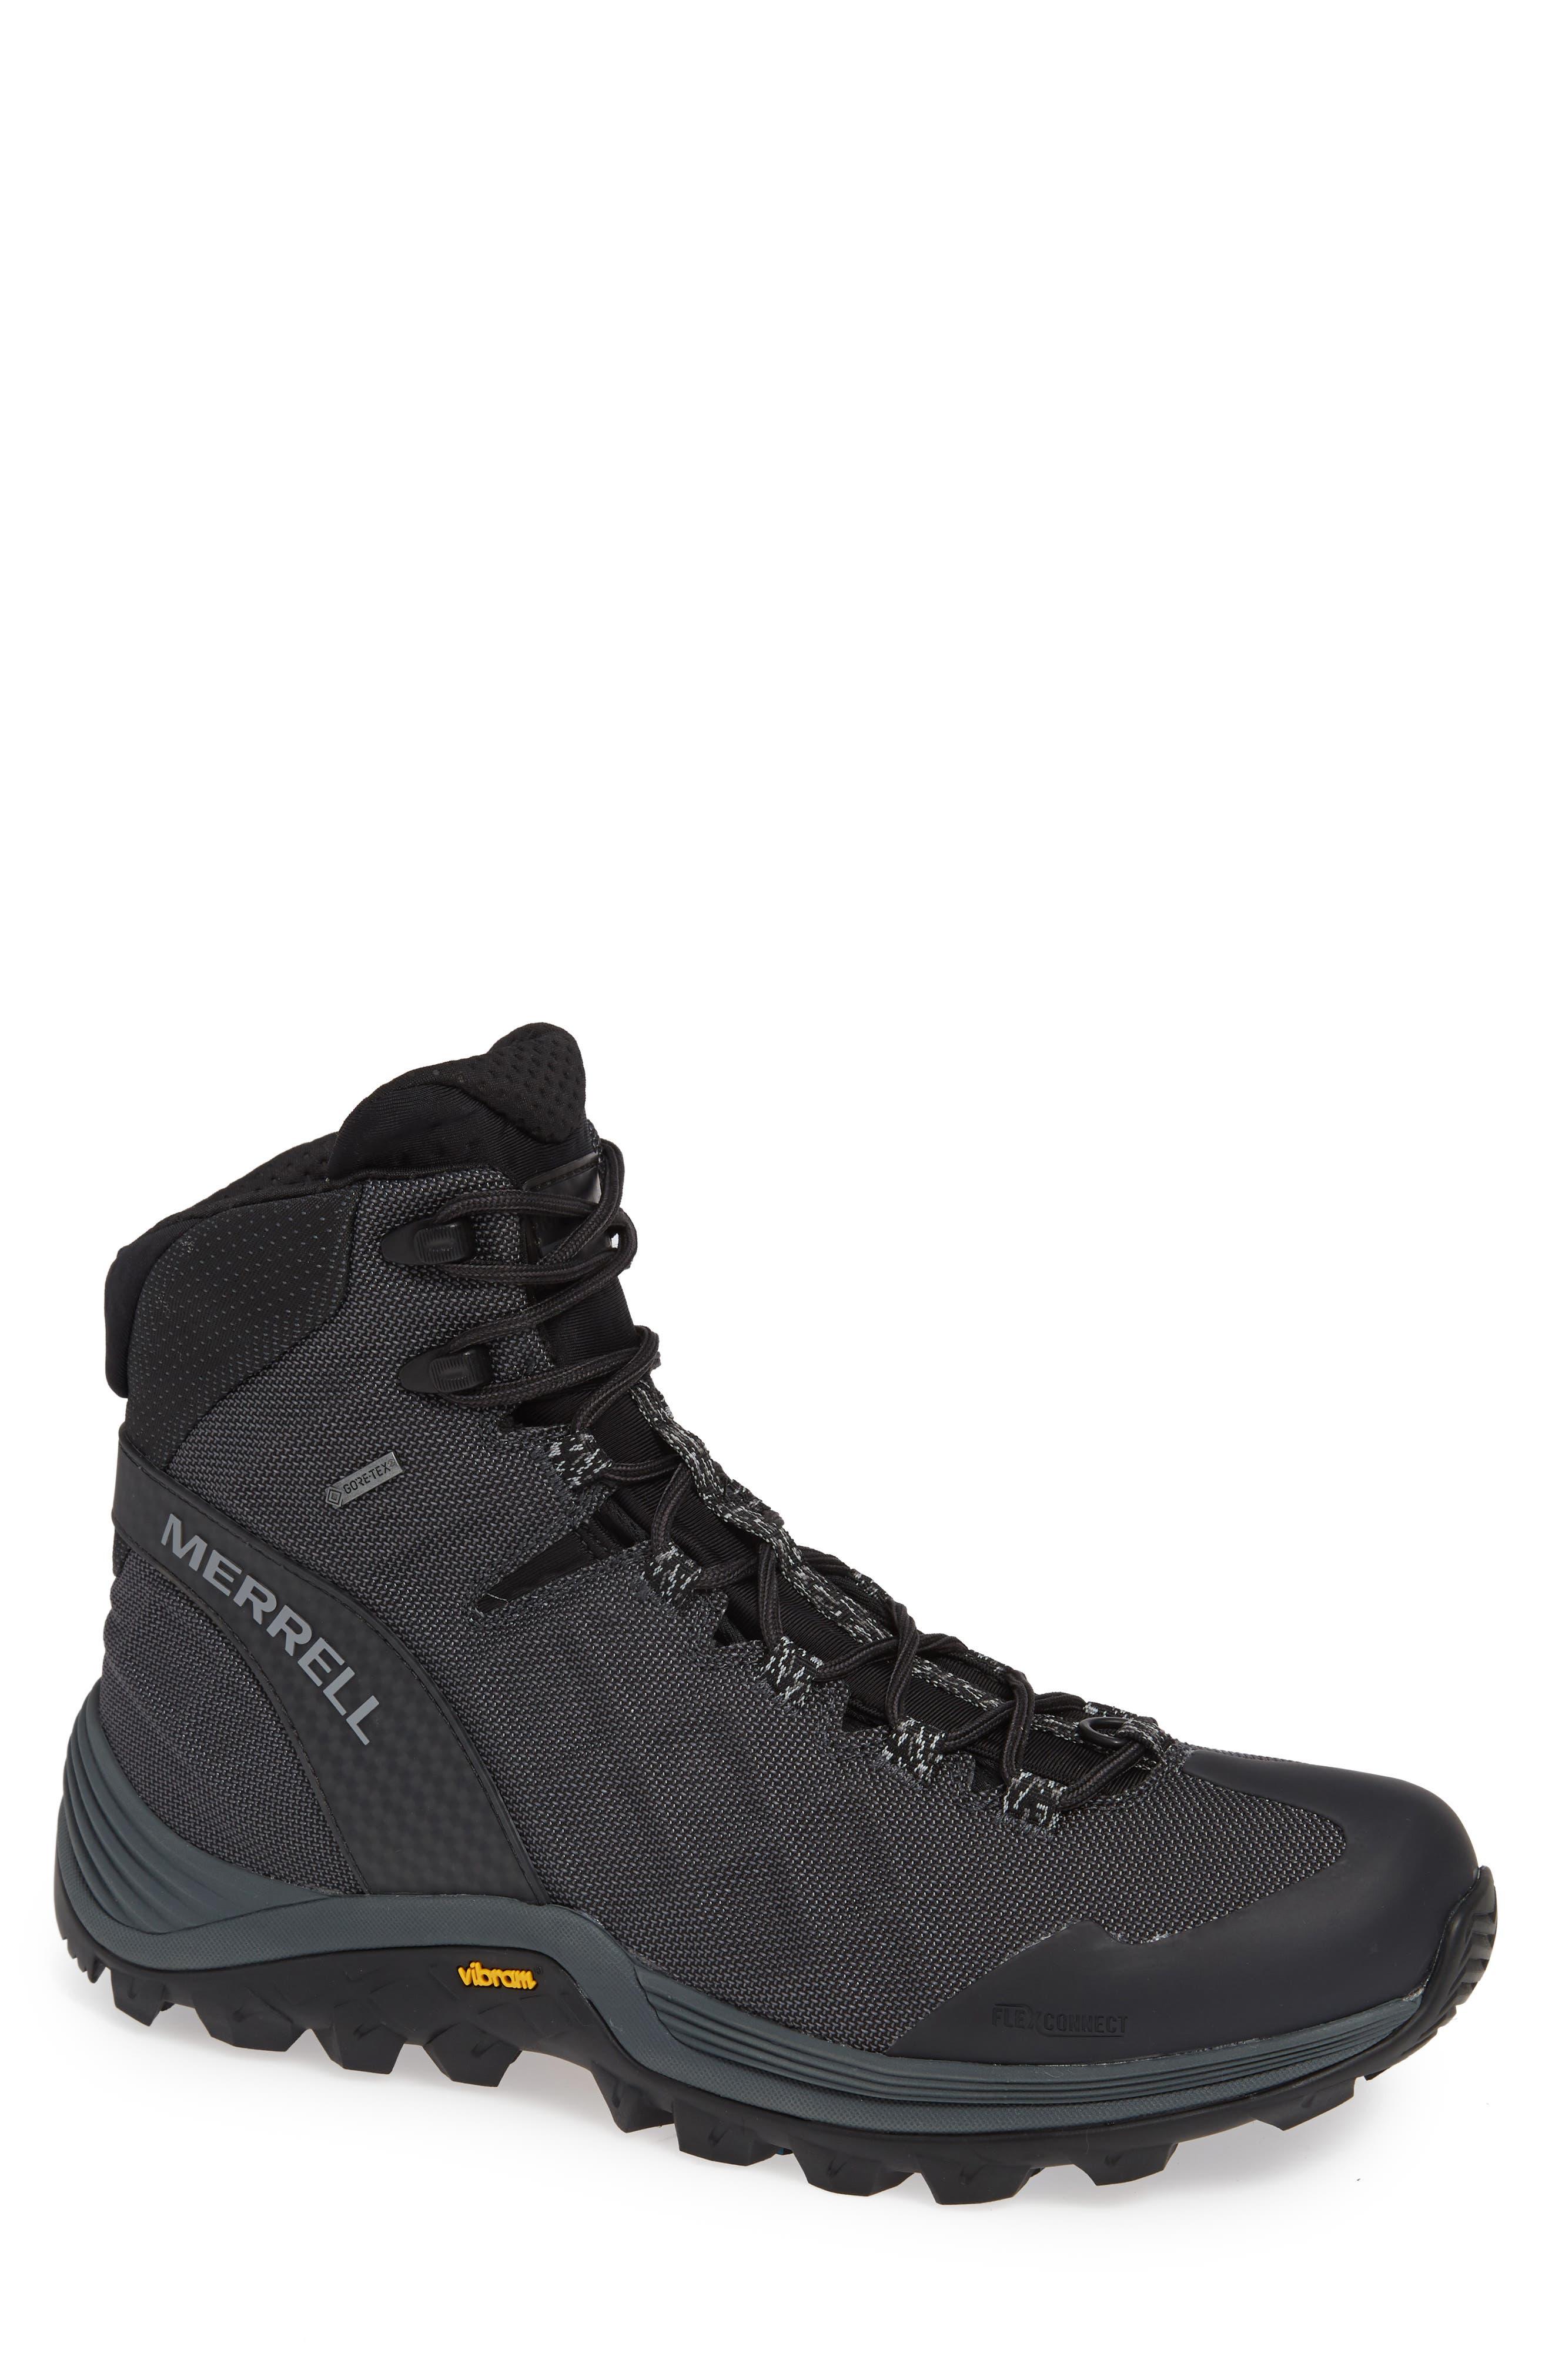 Thermo Rogue Gore-Tex<sup>®</sup> Waterproof Boot,                             Main thumbnail 1, color,                             BLACK